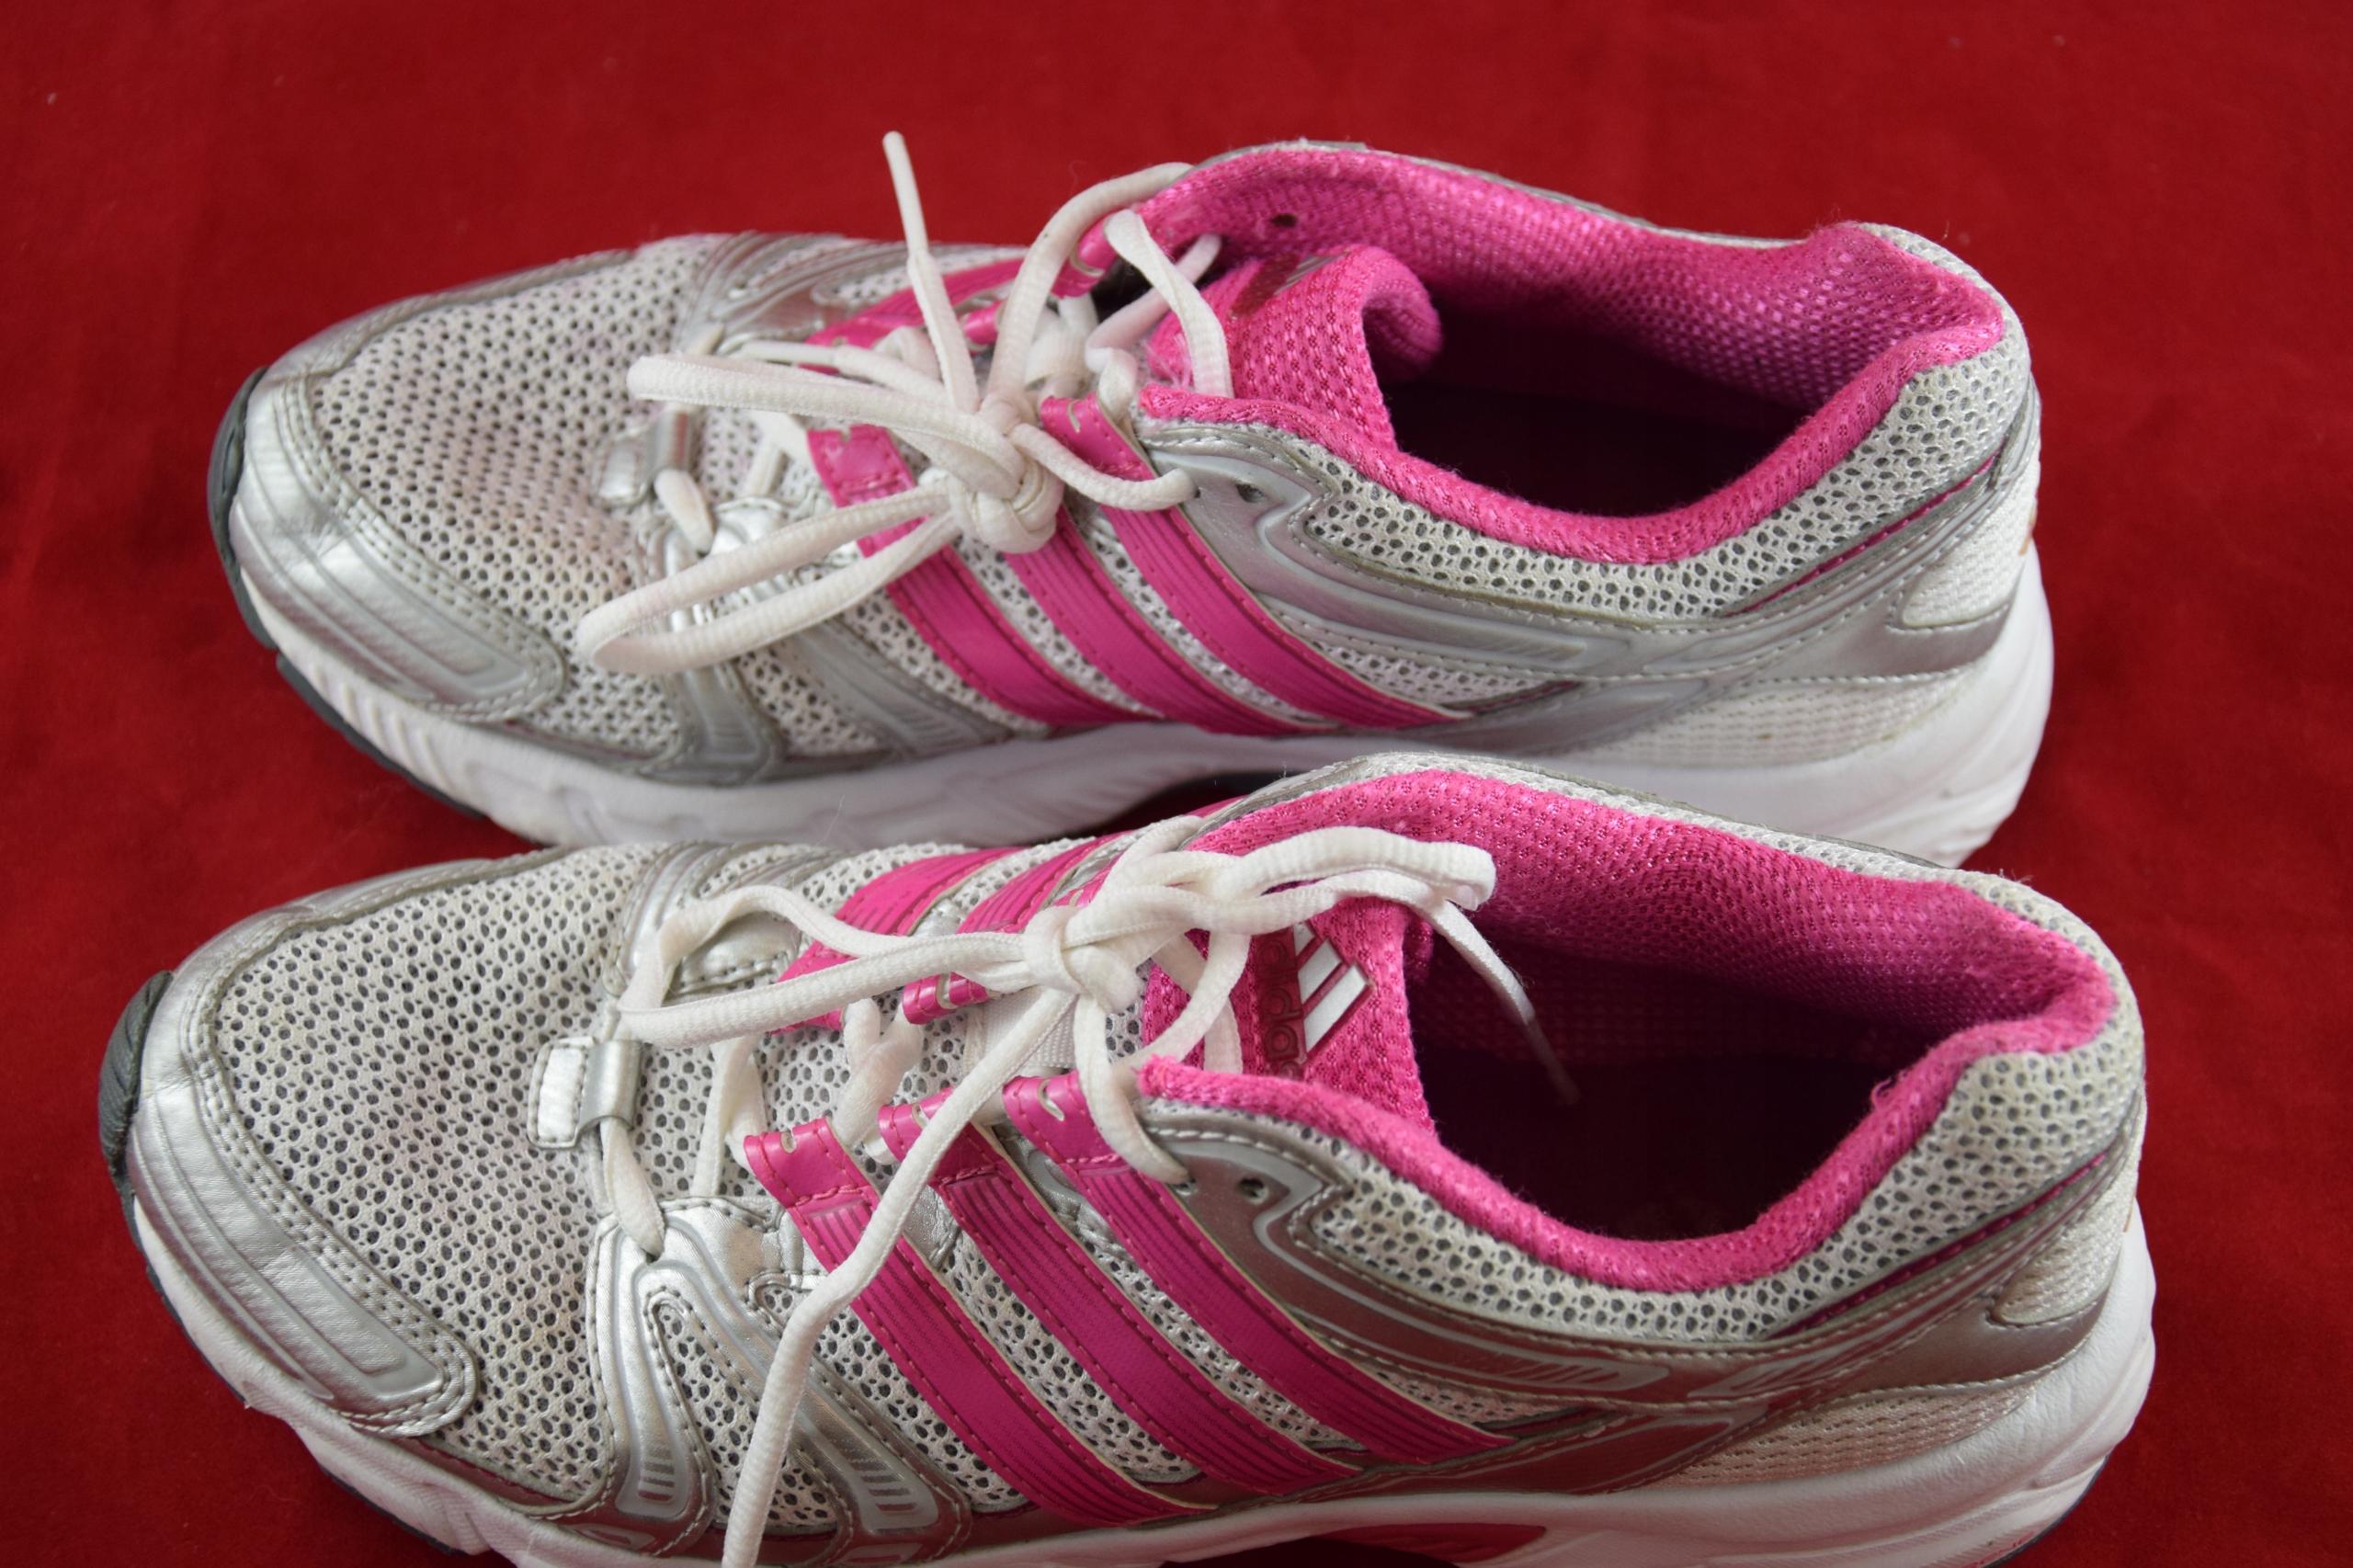 buty damskie adidas pyv 702001 12 09